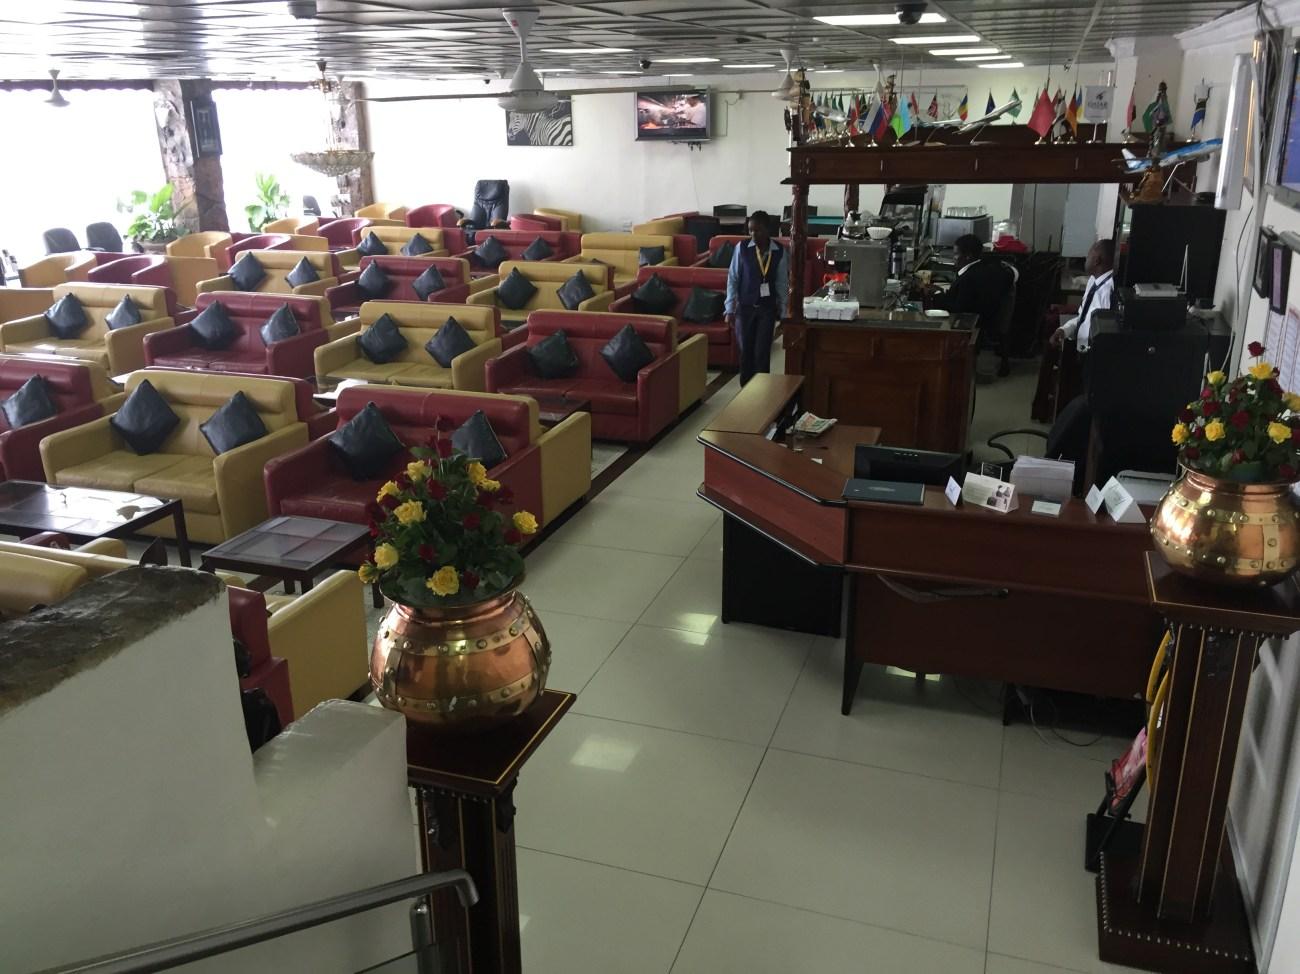 Tanzania Lounge Dar Es Salaam - 05